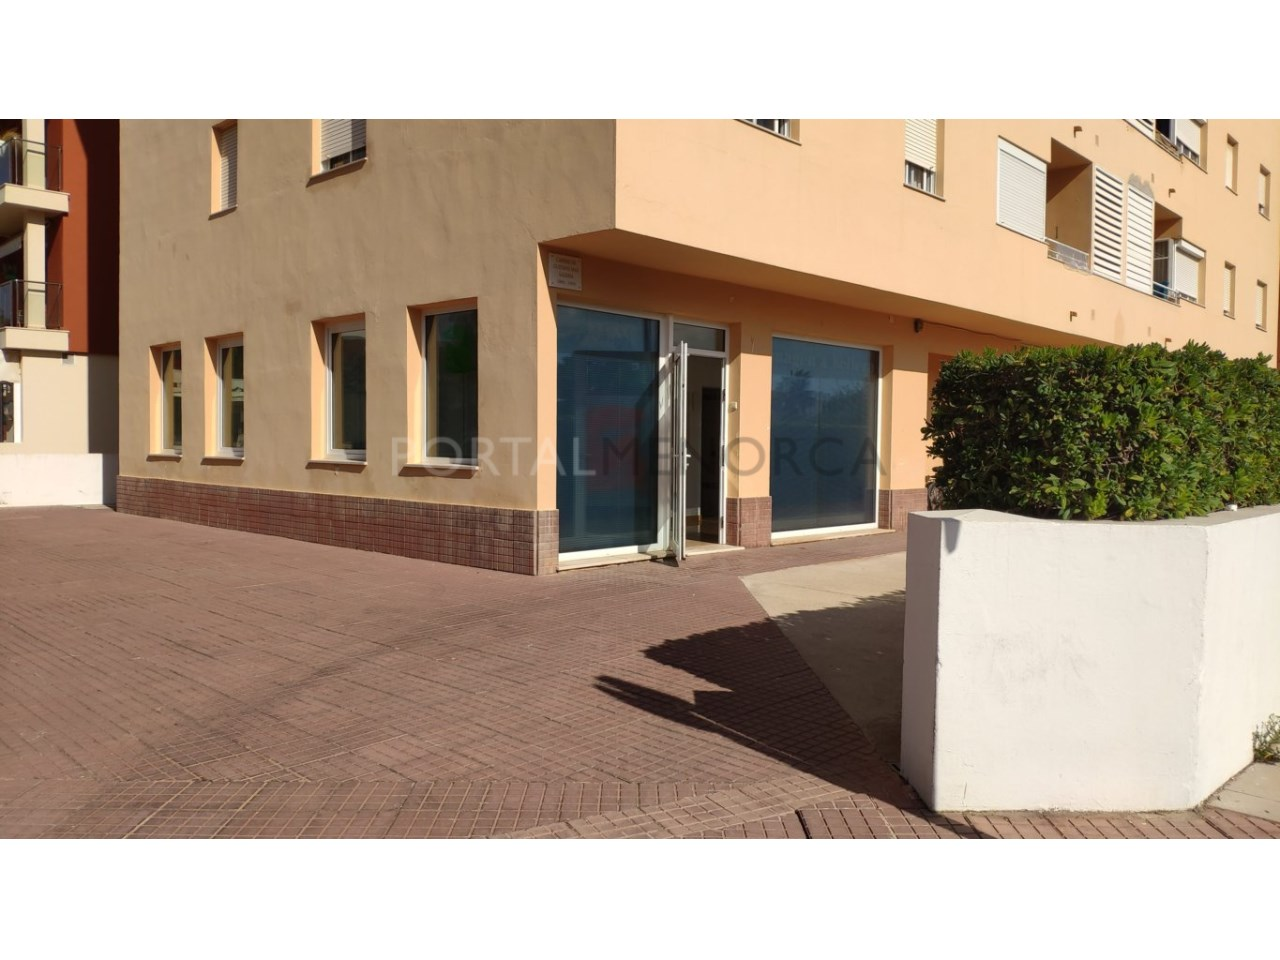 Local for sale in Ciutadella Menorca-Facade